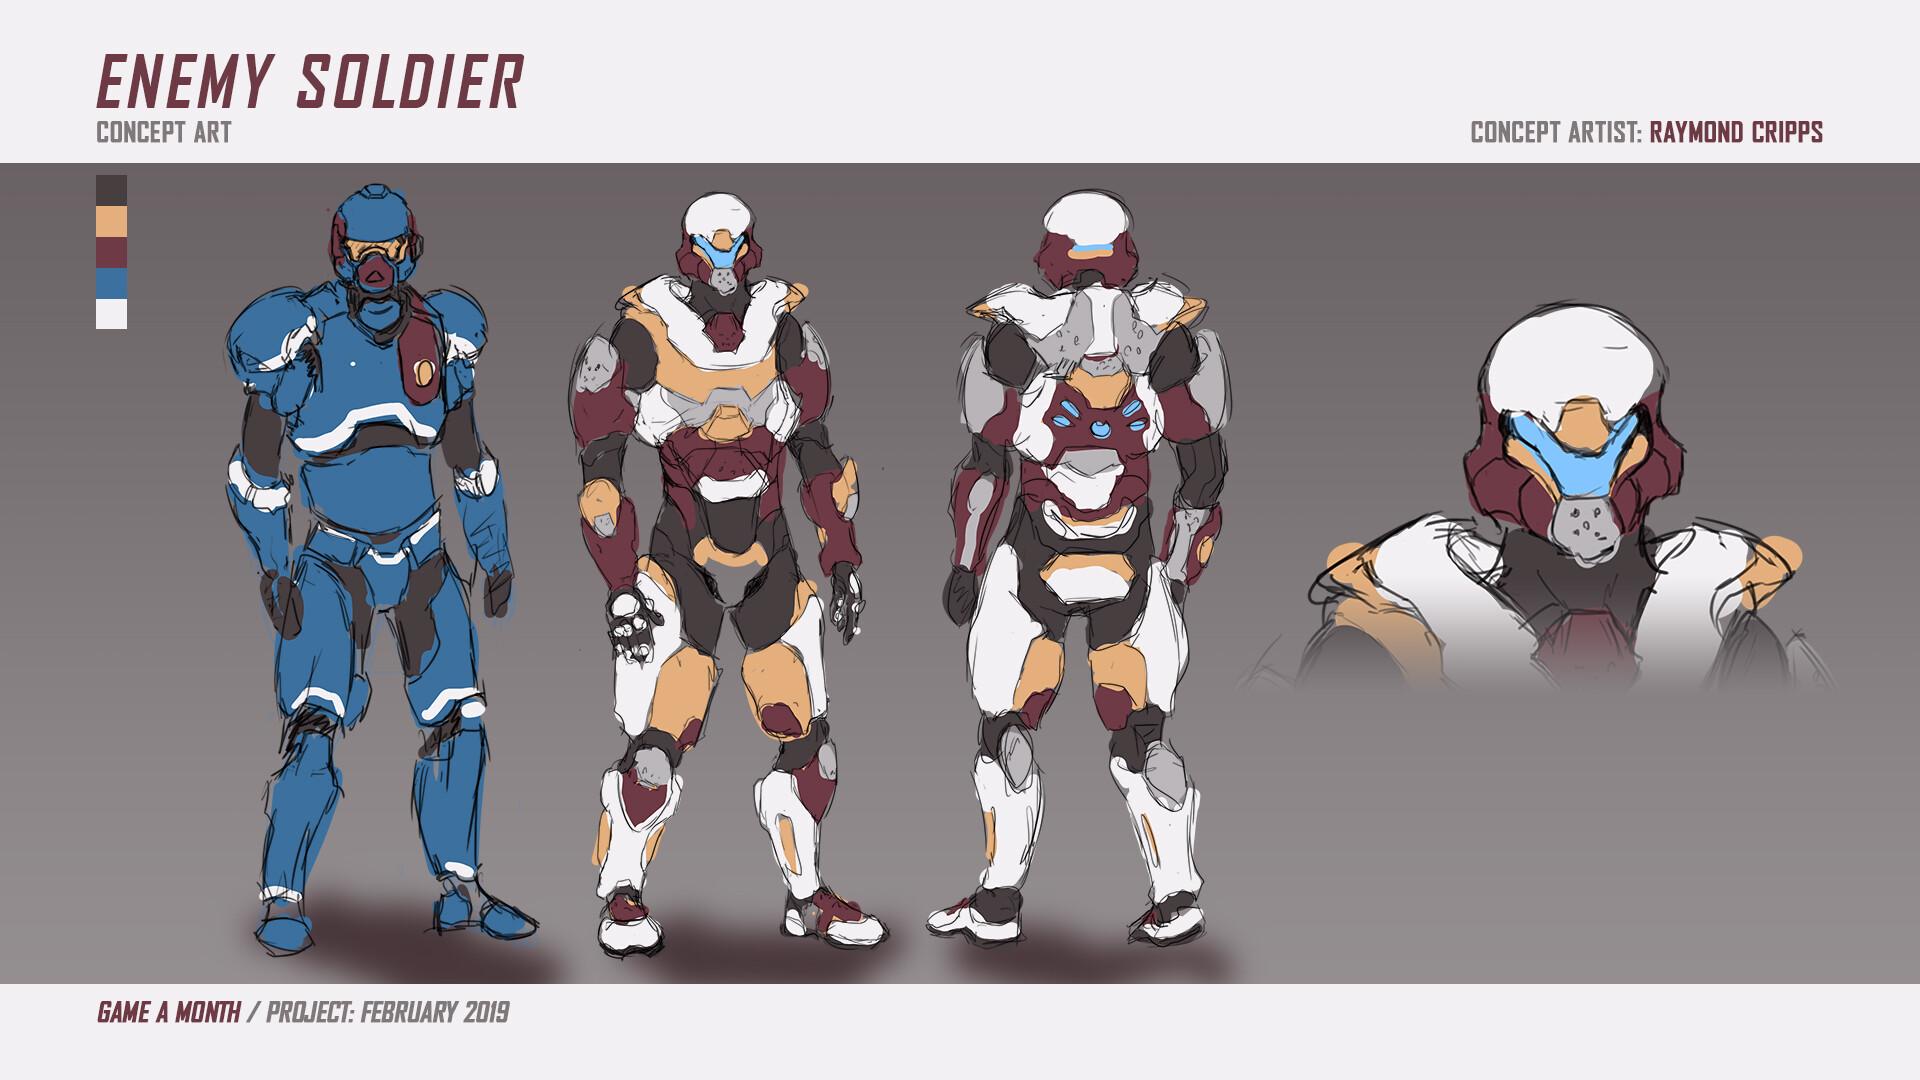 Enemy Soldier concept art